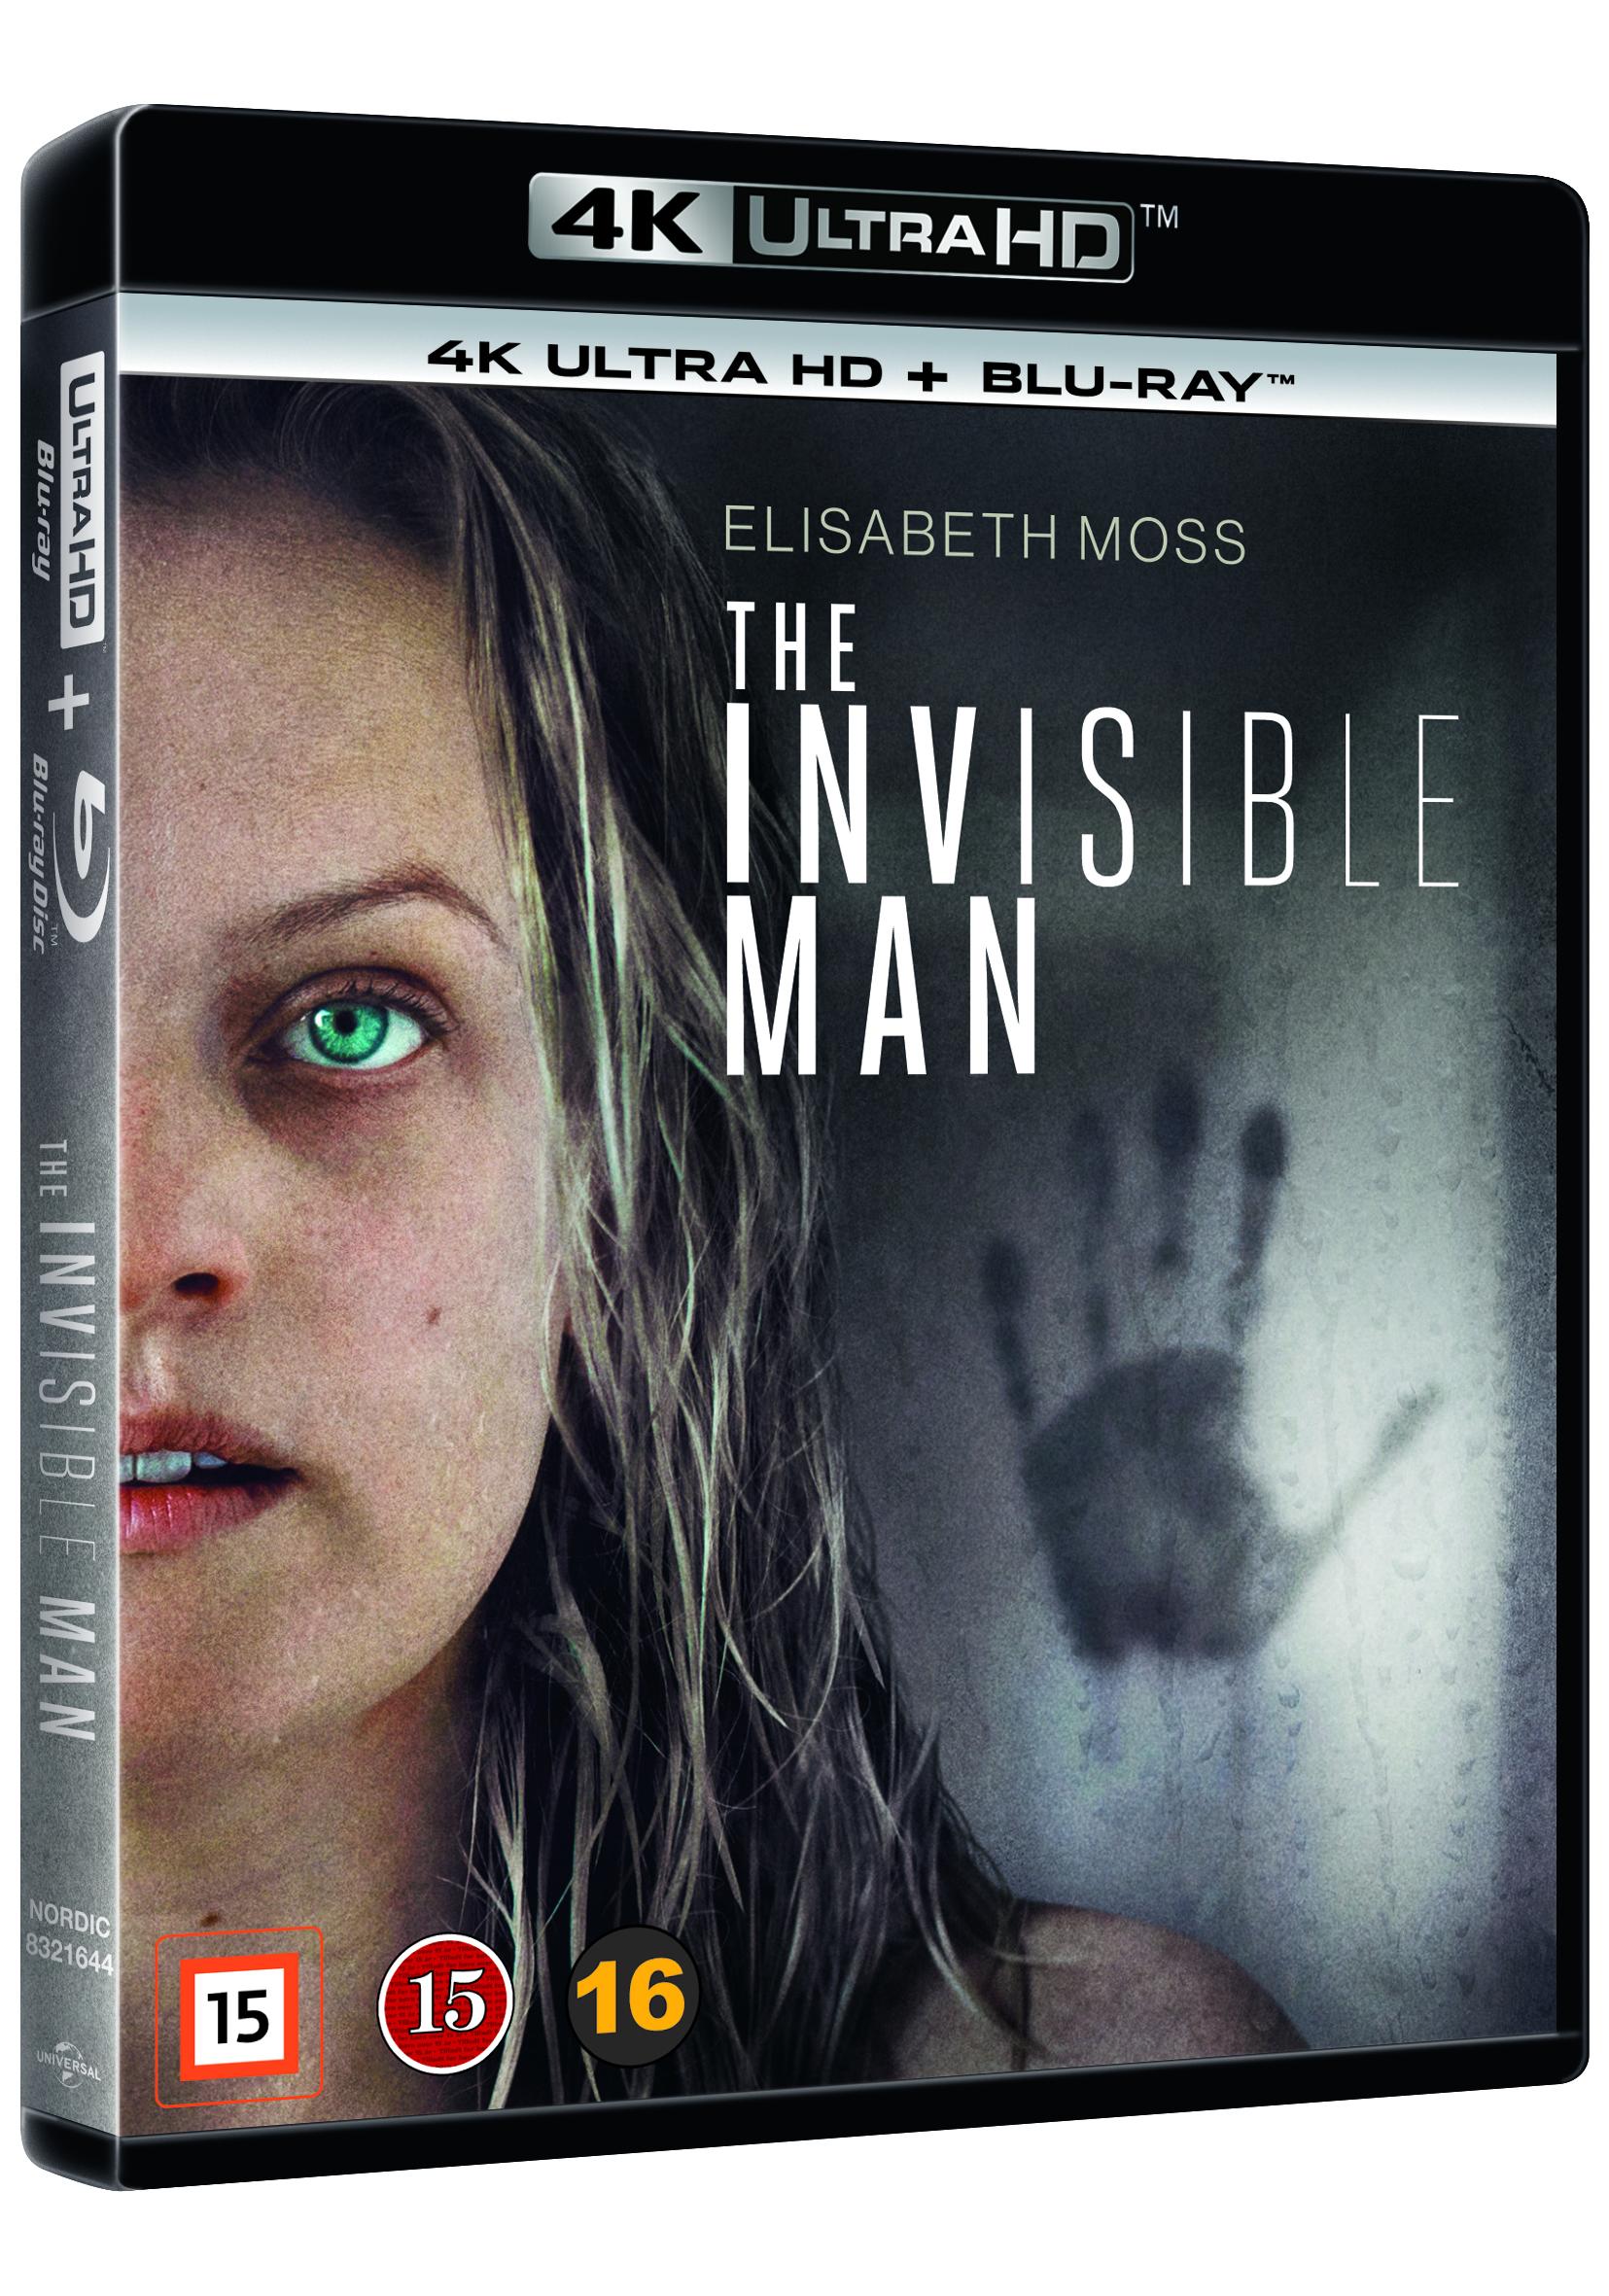 Invisible Man (2020), The - 4K Uhd+ Blu Ray